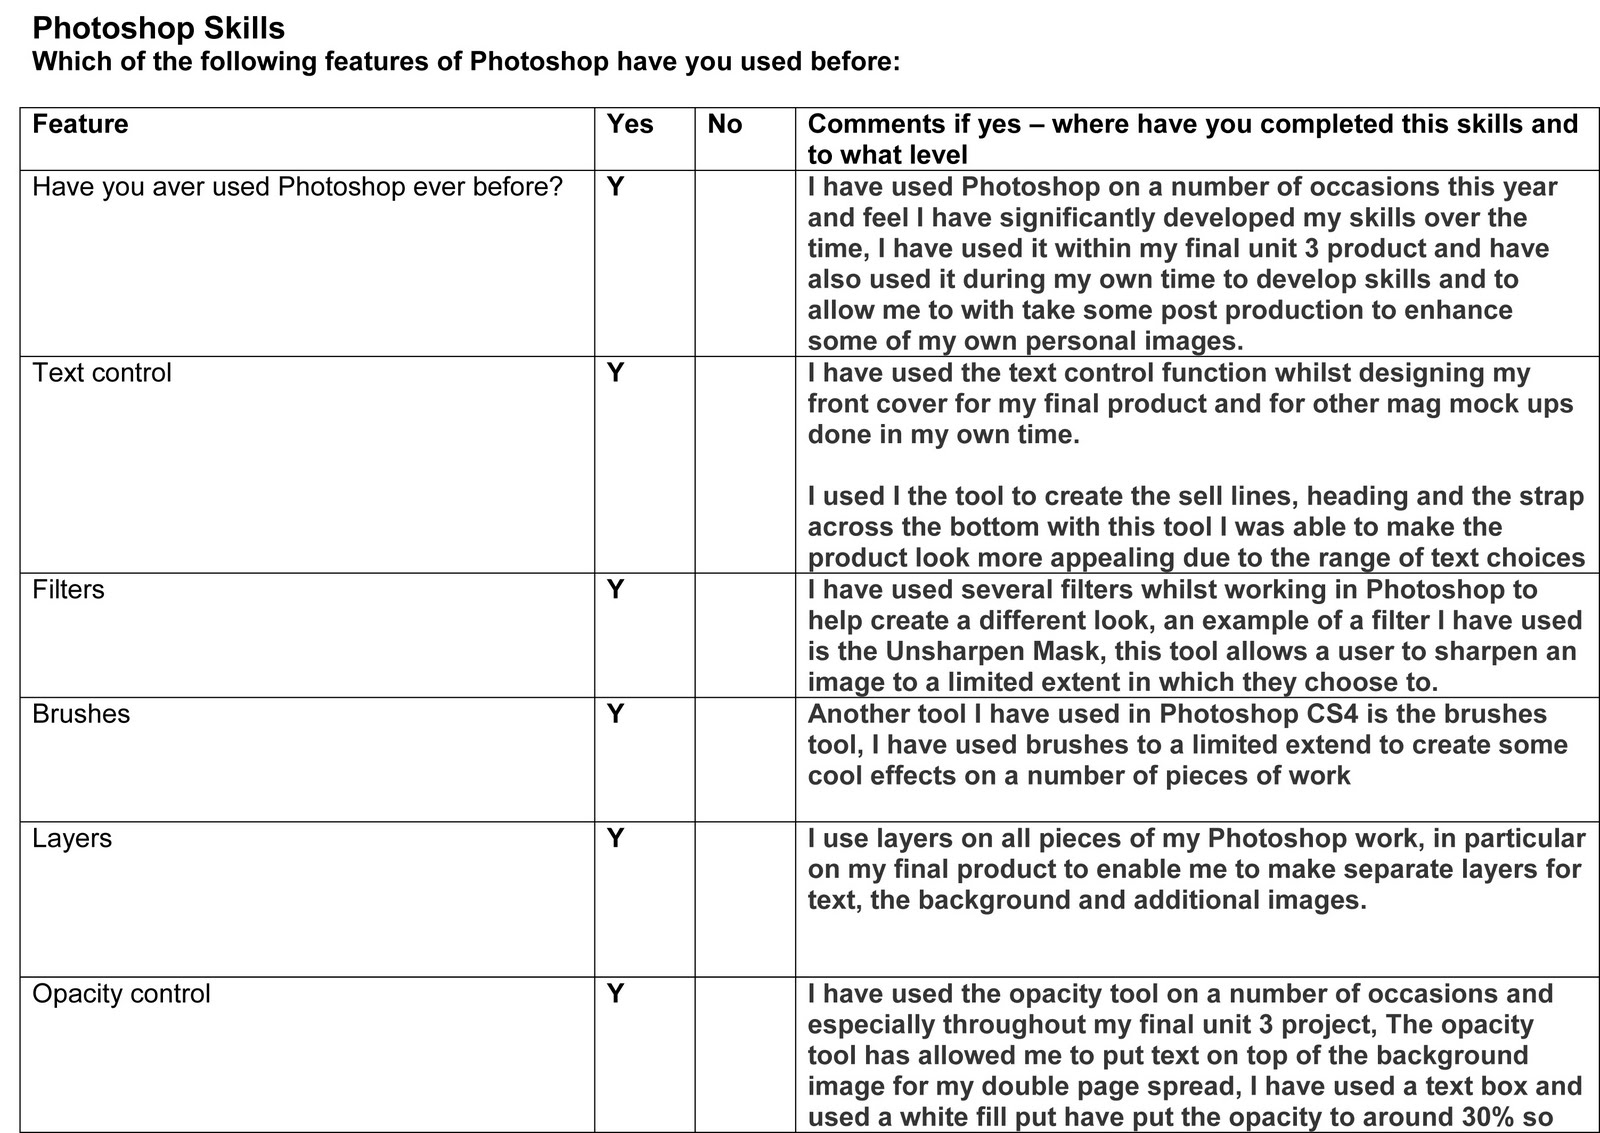 sample audit report template – Sample Audit Report Template